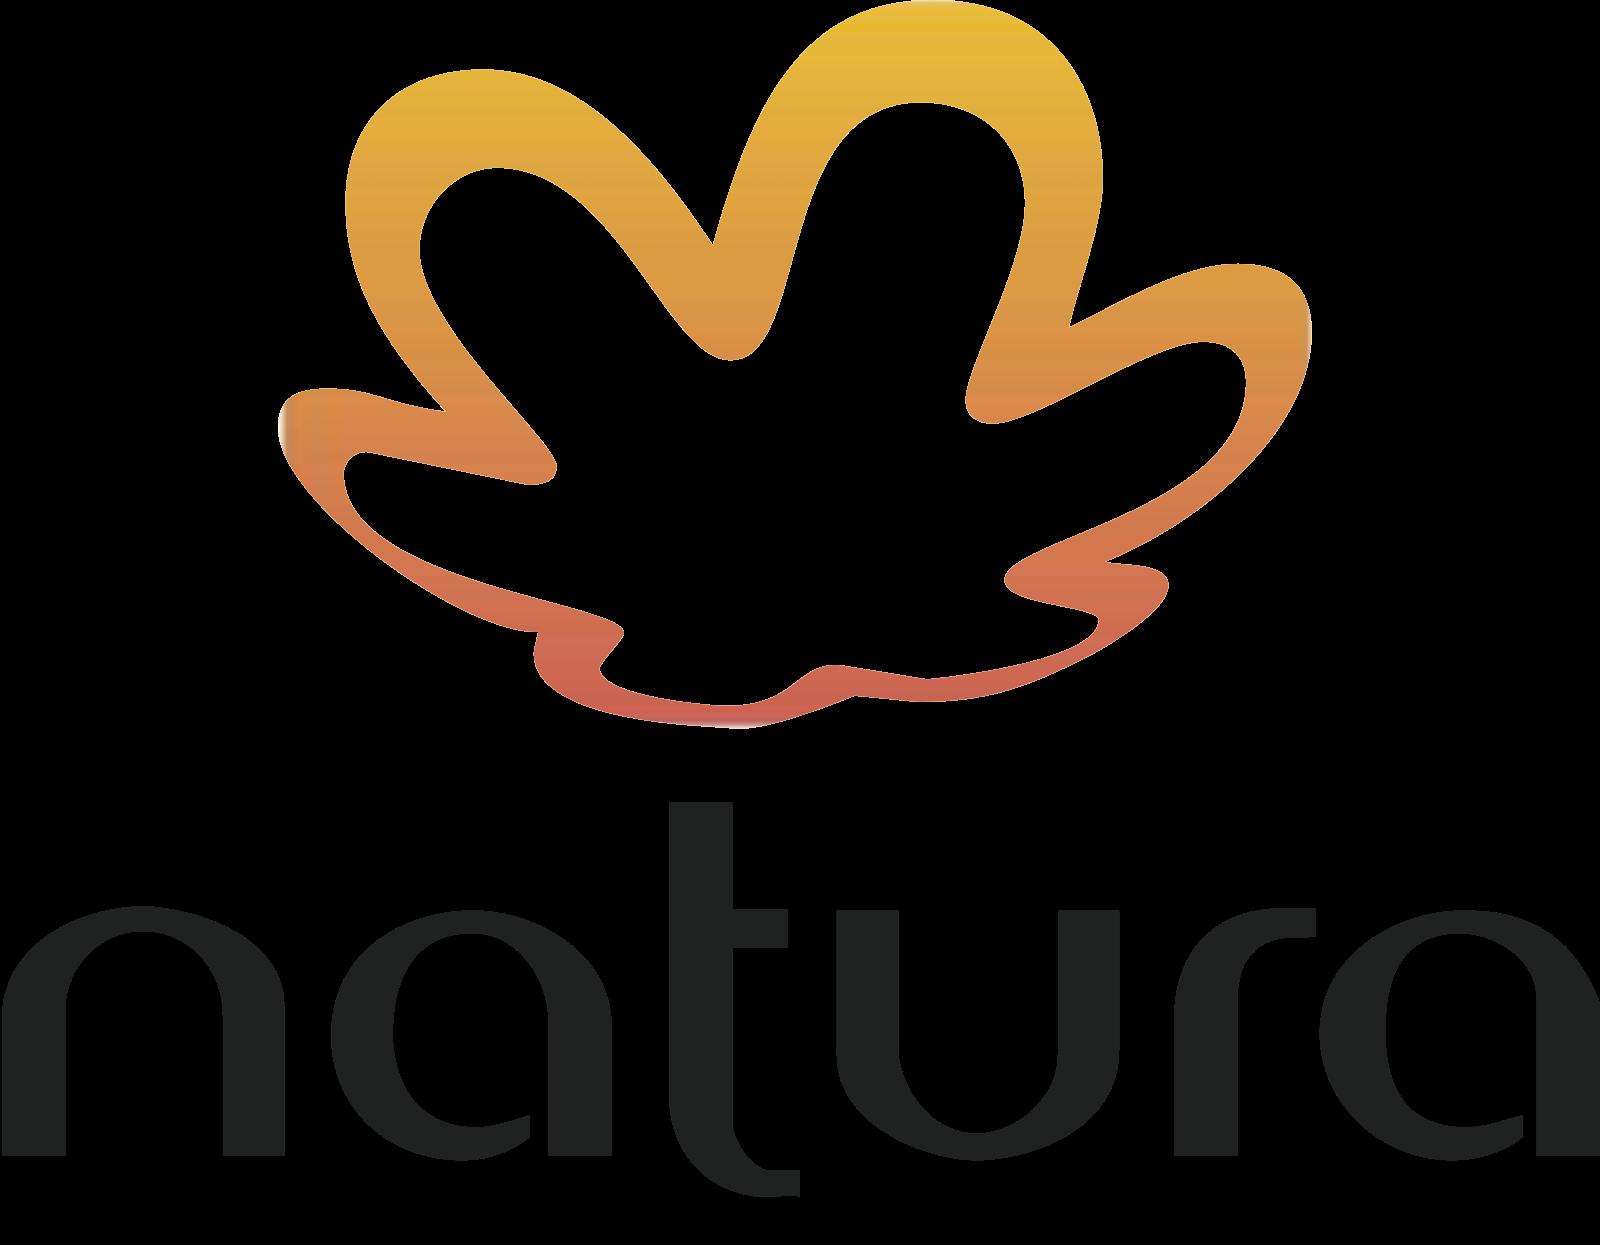 natura-logo-5